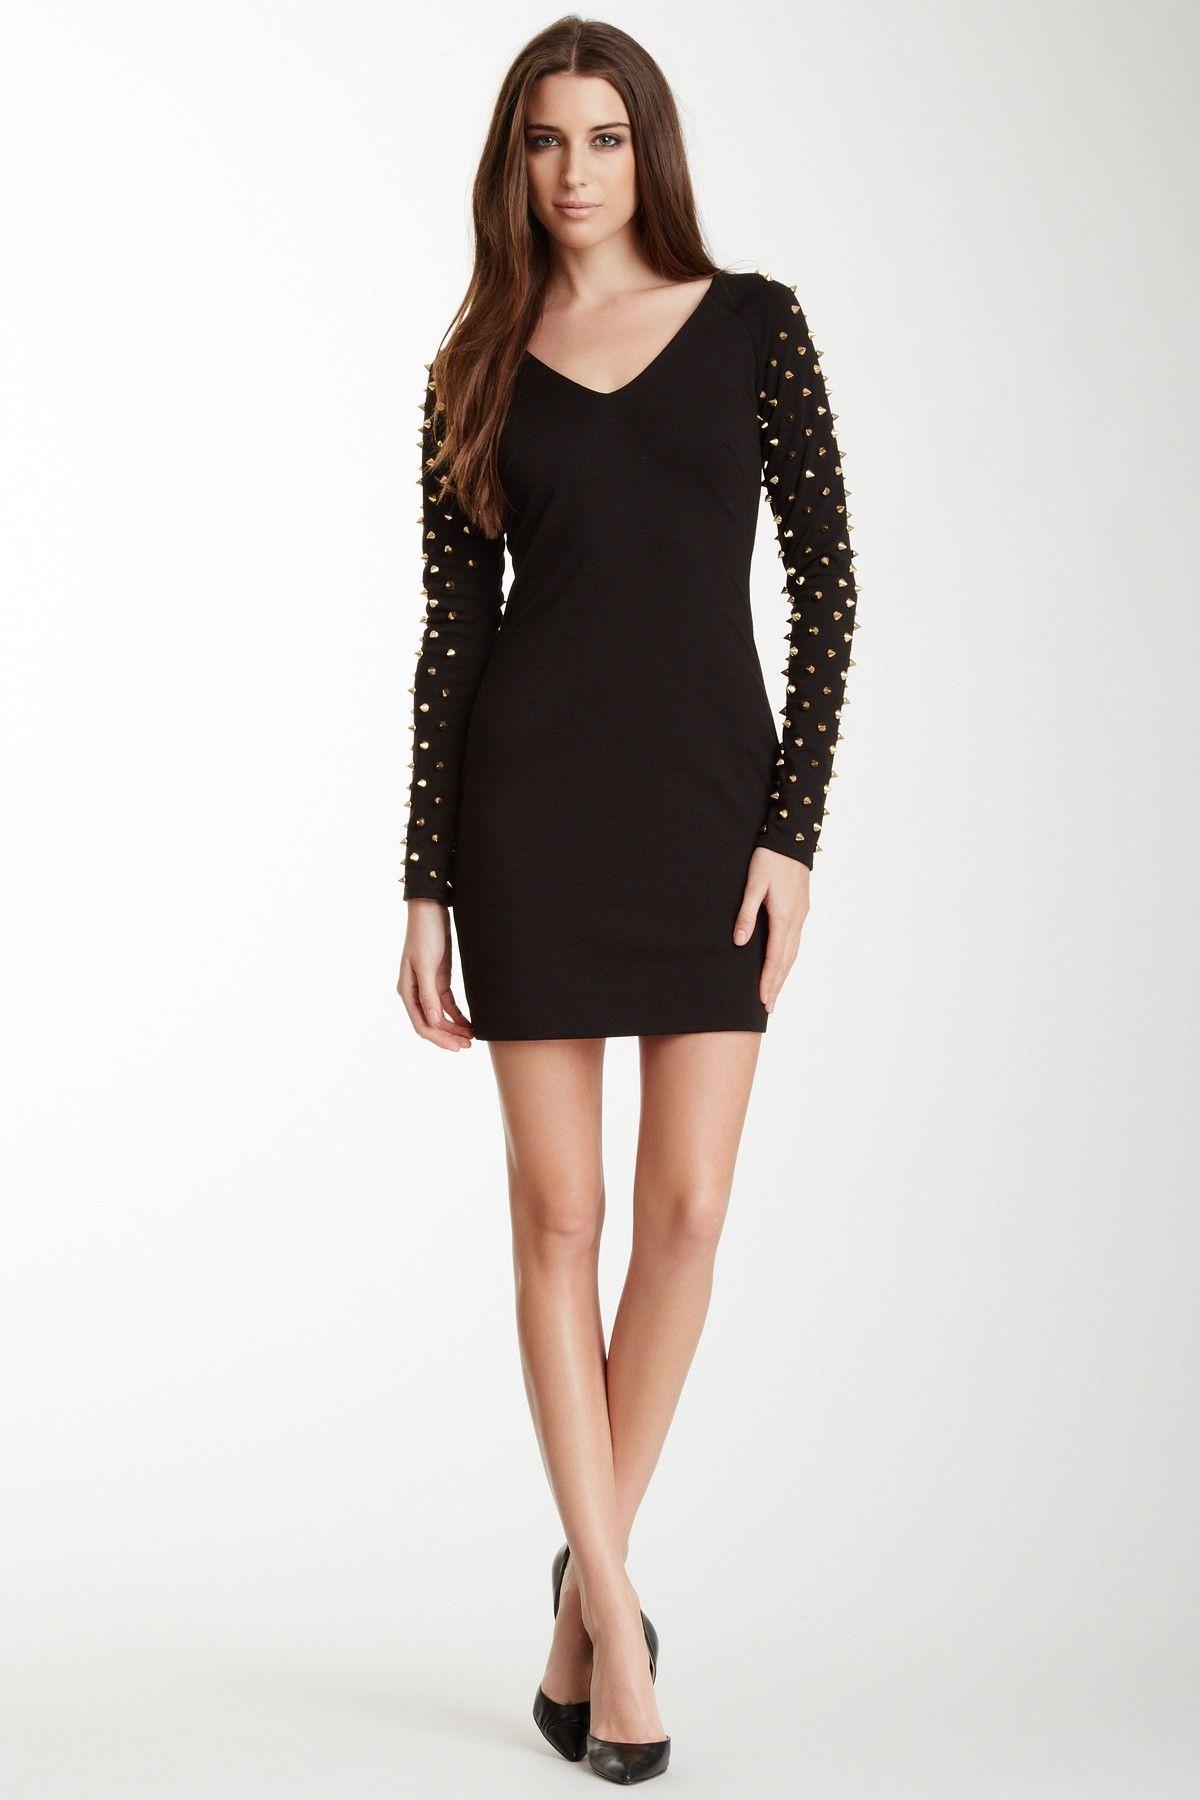 London Studded Sleeve Dress